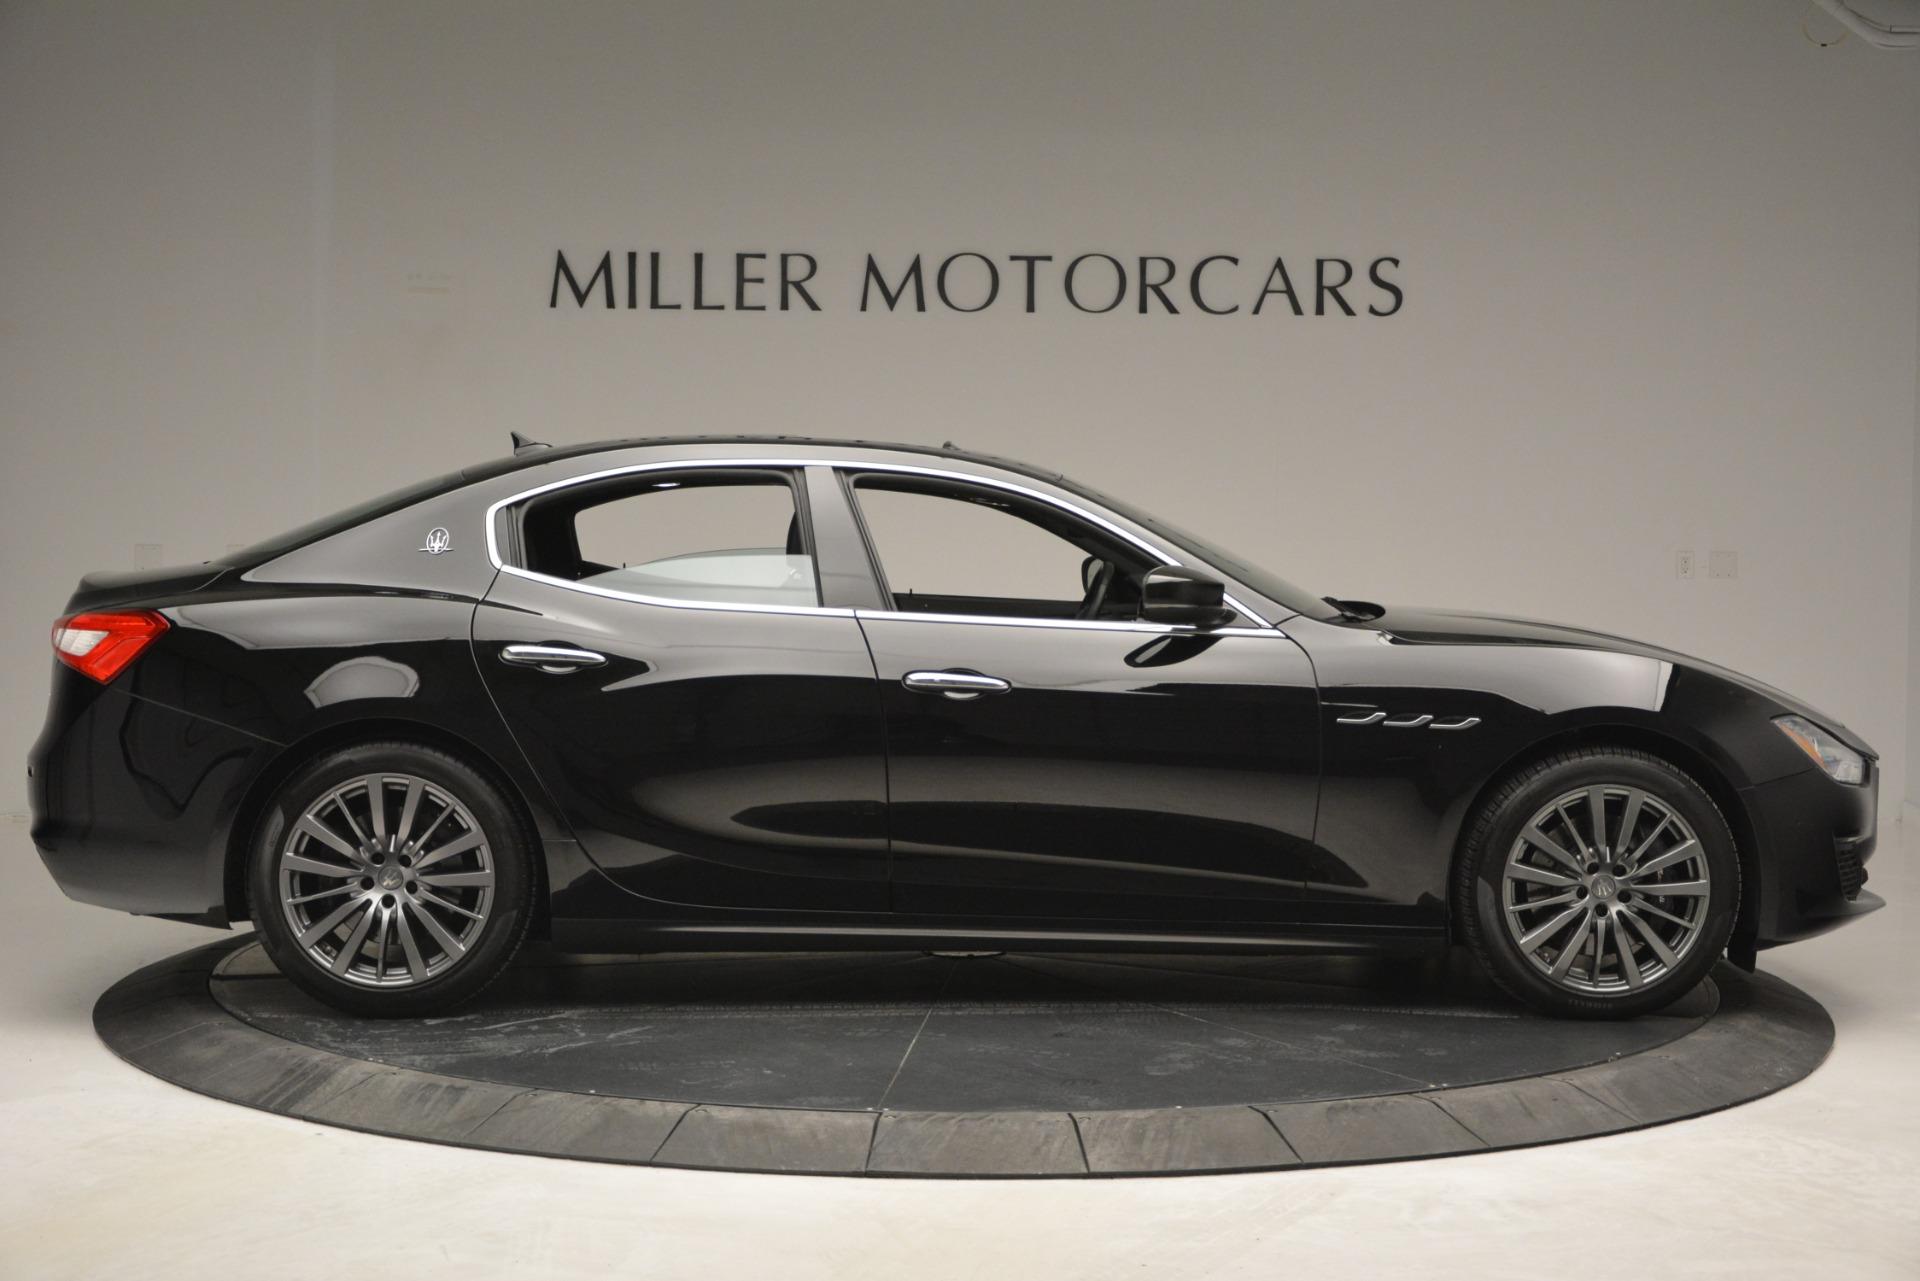 Used 2018 Maserati Ghibli S Q4 For Sale In Greenwich, CT. Alfa Romeo of Greenwich, 7481 2944_p12